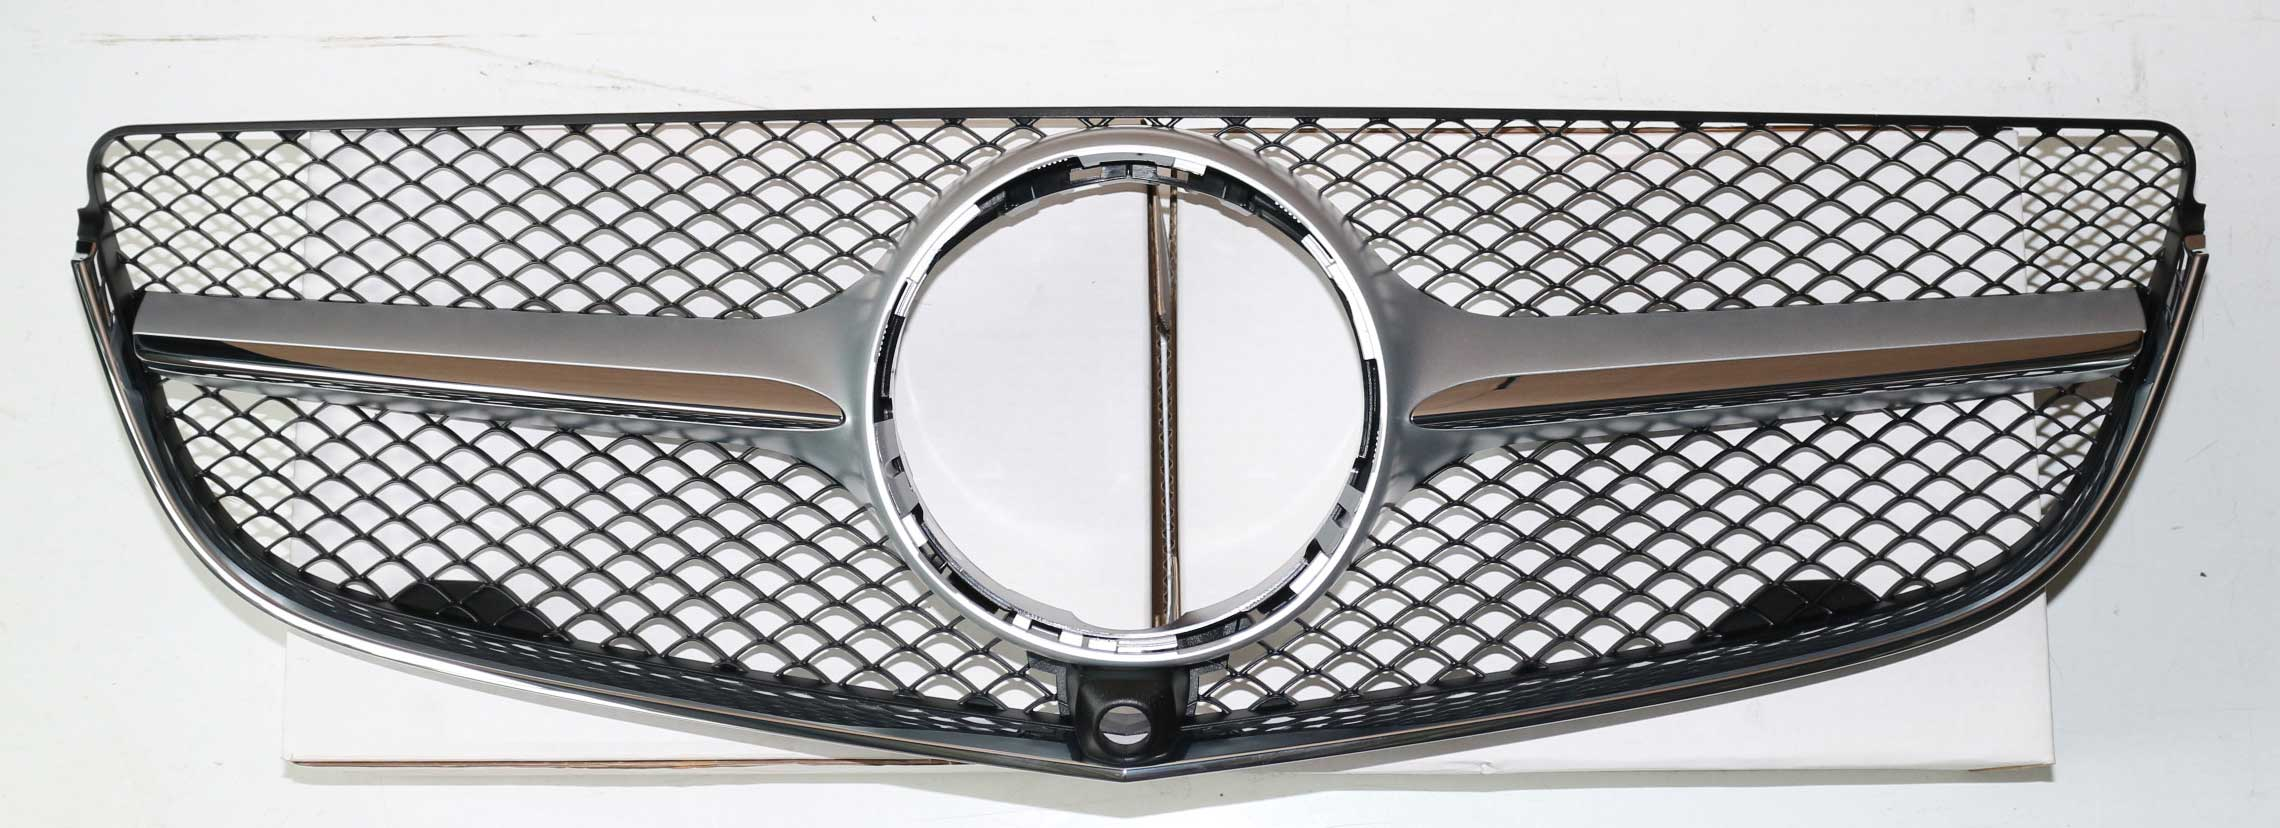 mercedes e klasse coupe cabrio c207 a207 k hlergrill grill. Black Bedroom Furniture Sets. Home Design Ideas